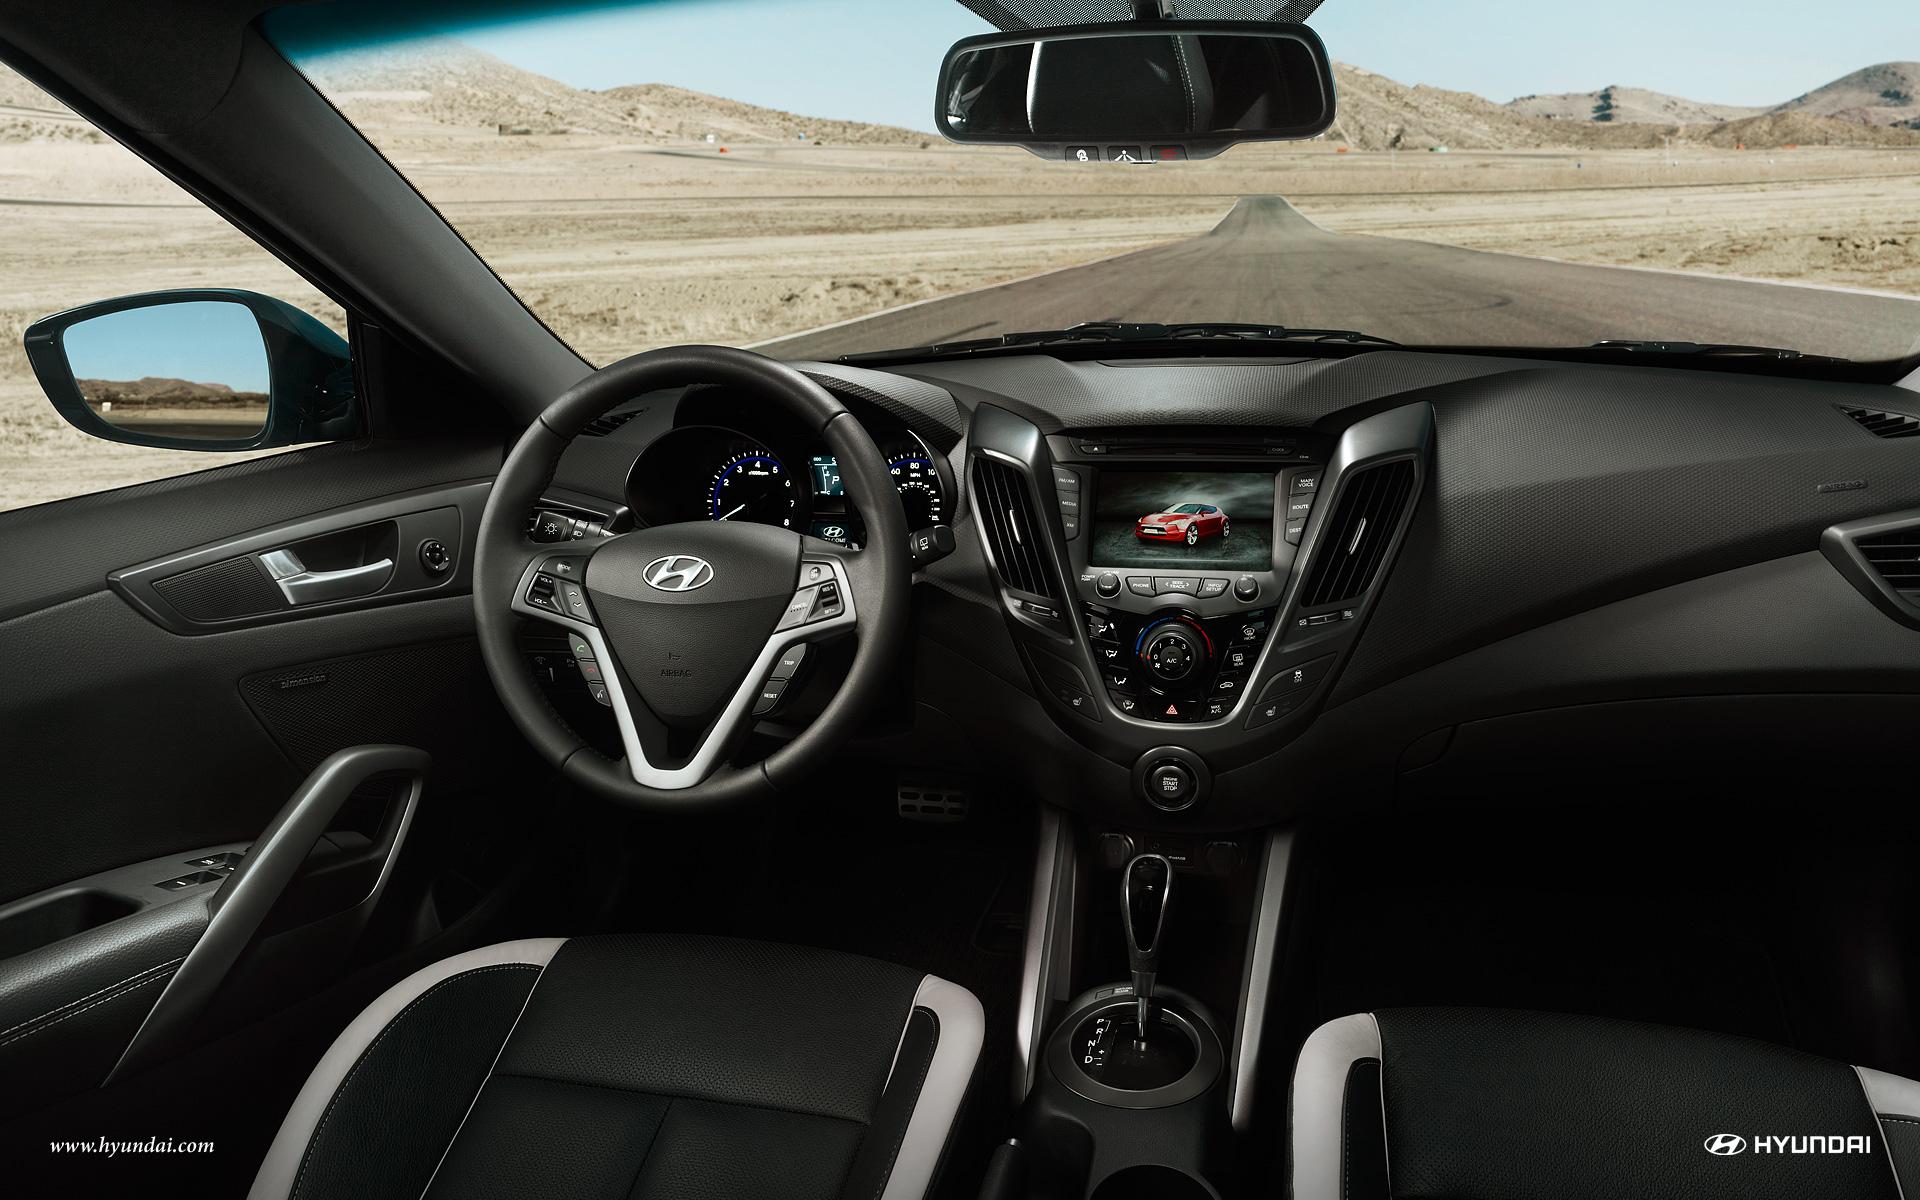 2013 hyundai veloster turbo savage on wheels for Hyundai veloster interior